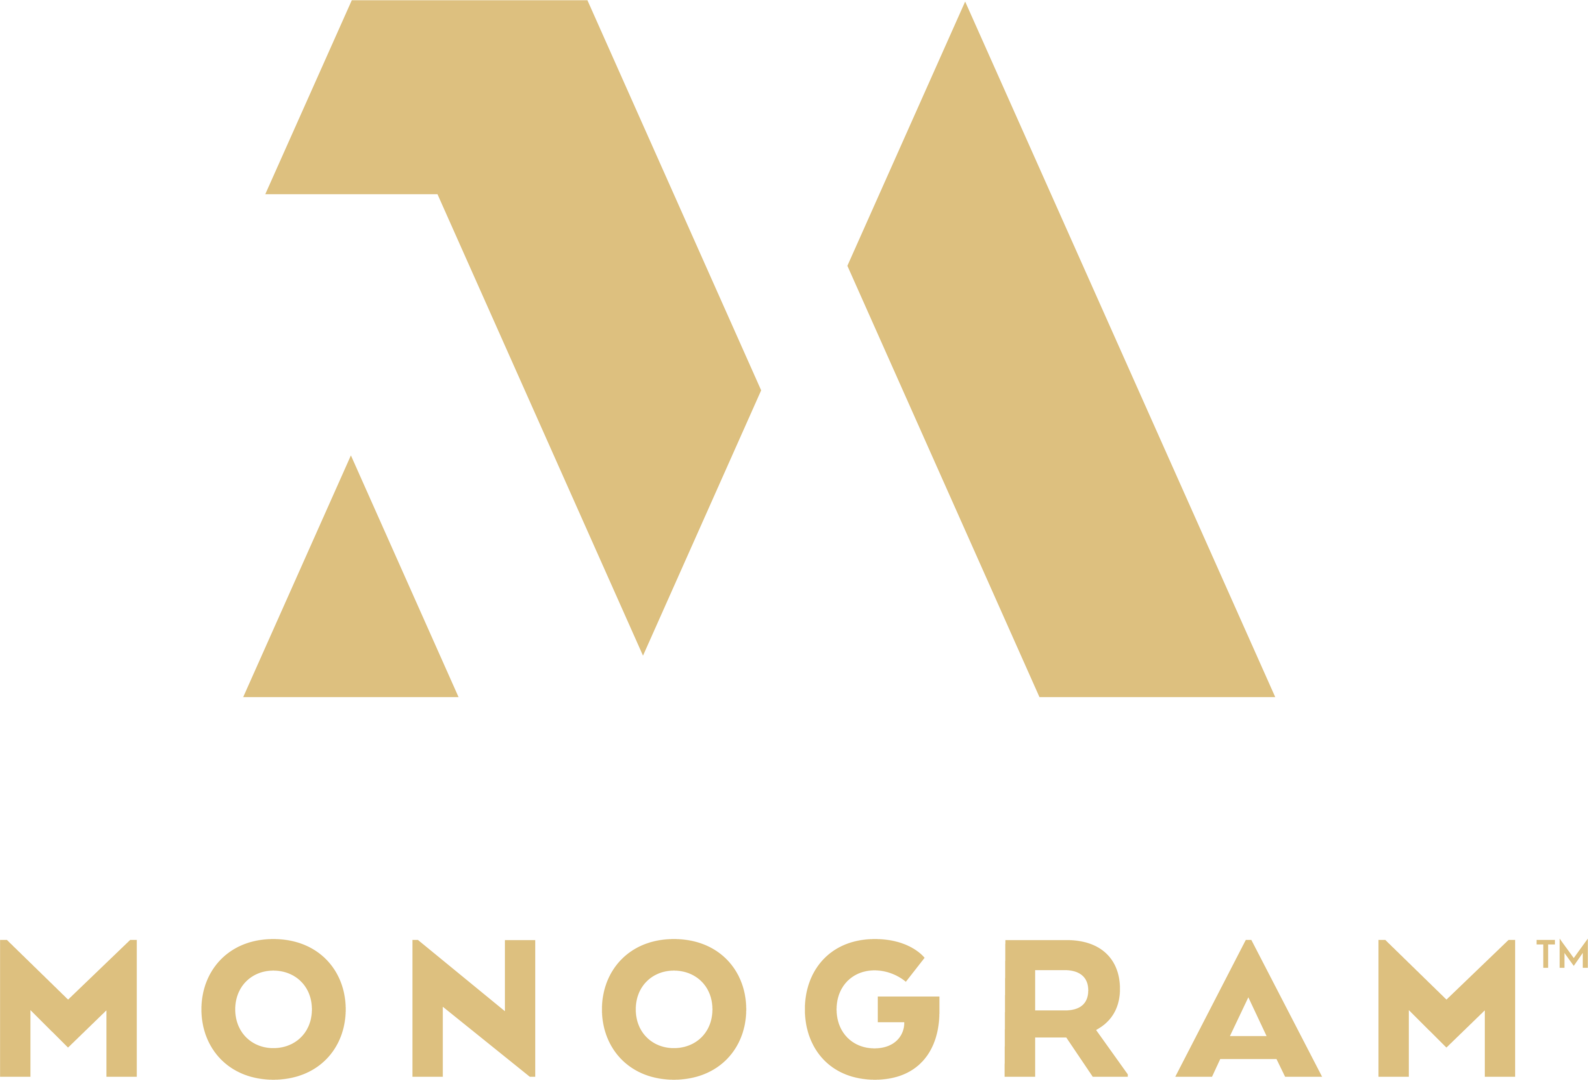 https://secureservercdn.net/198.12.144.107/3gj.147.myftpupload.com/wp-content/uploads/2021/05/Tan-Monogram-Logo-June-2020.png